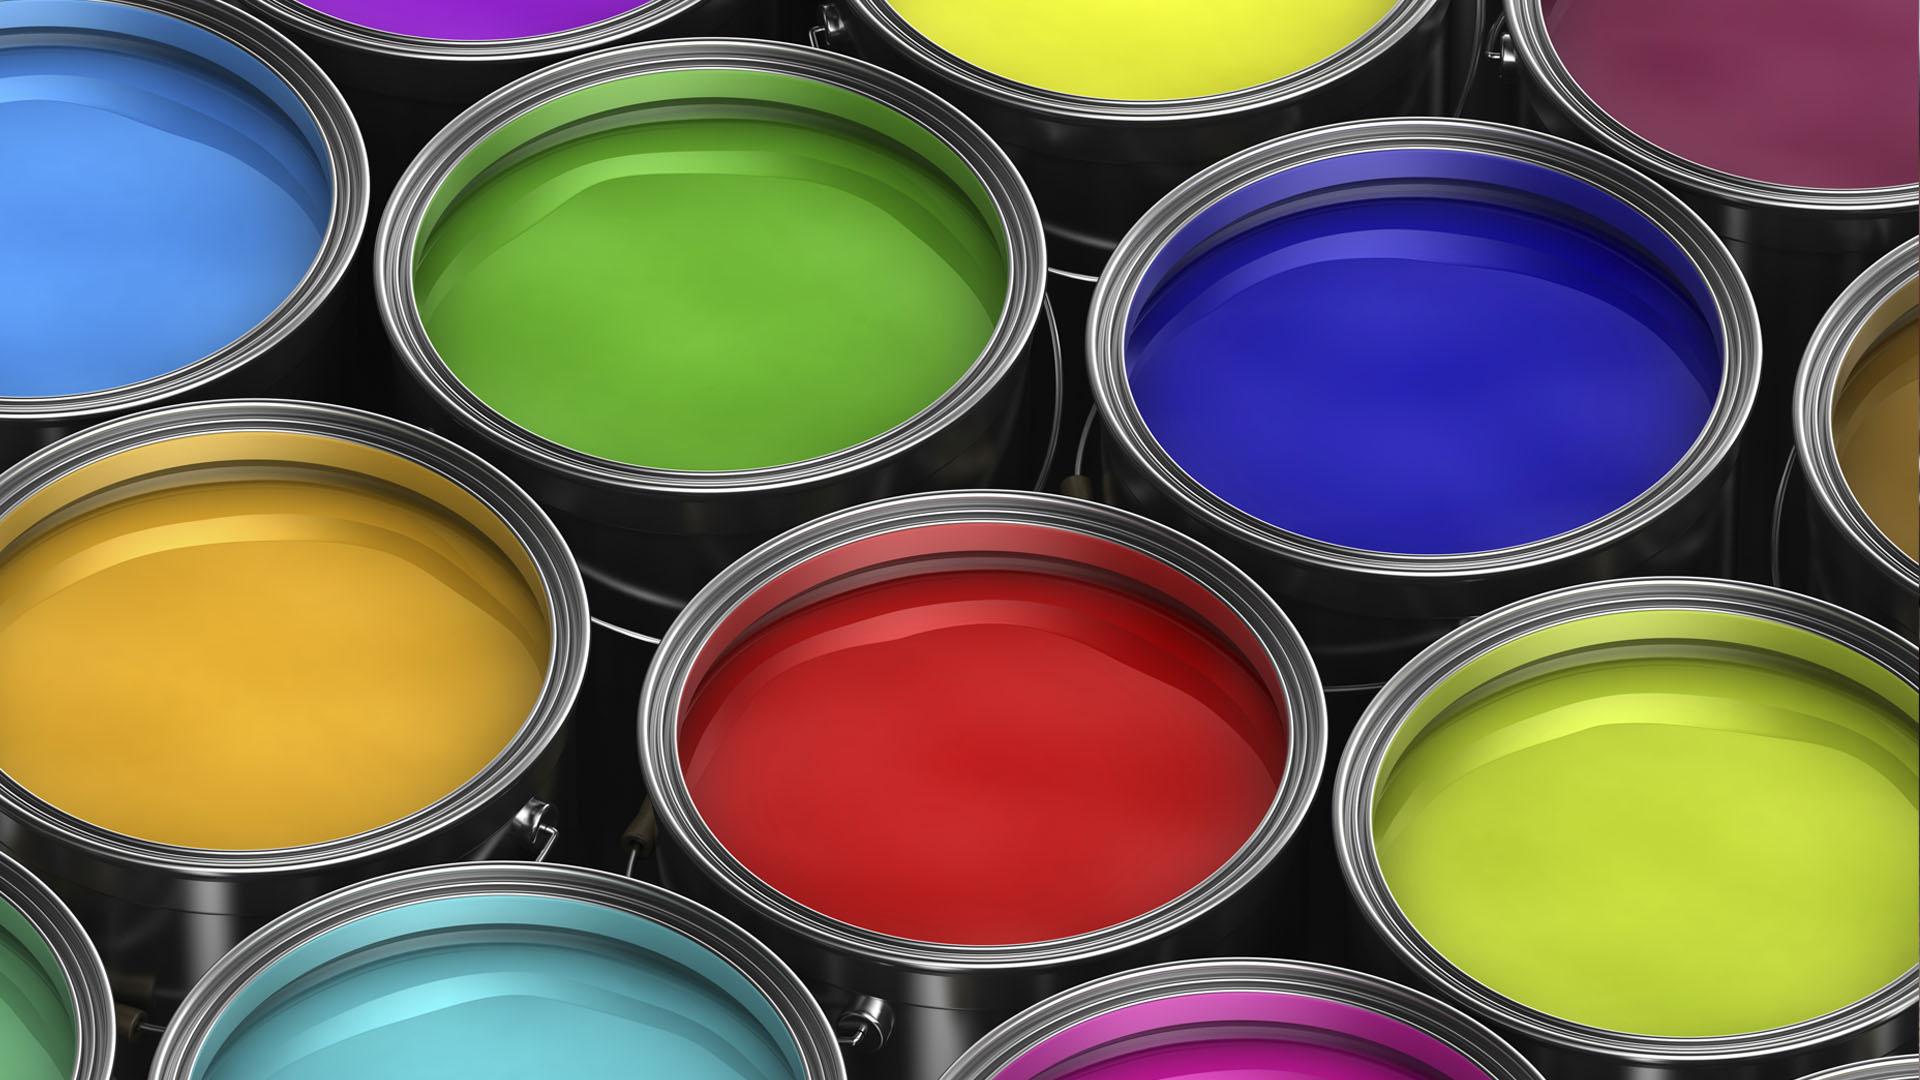 Lashlee Painting & Remodeling - Lake Jackson, TX